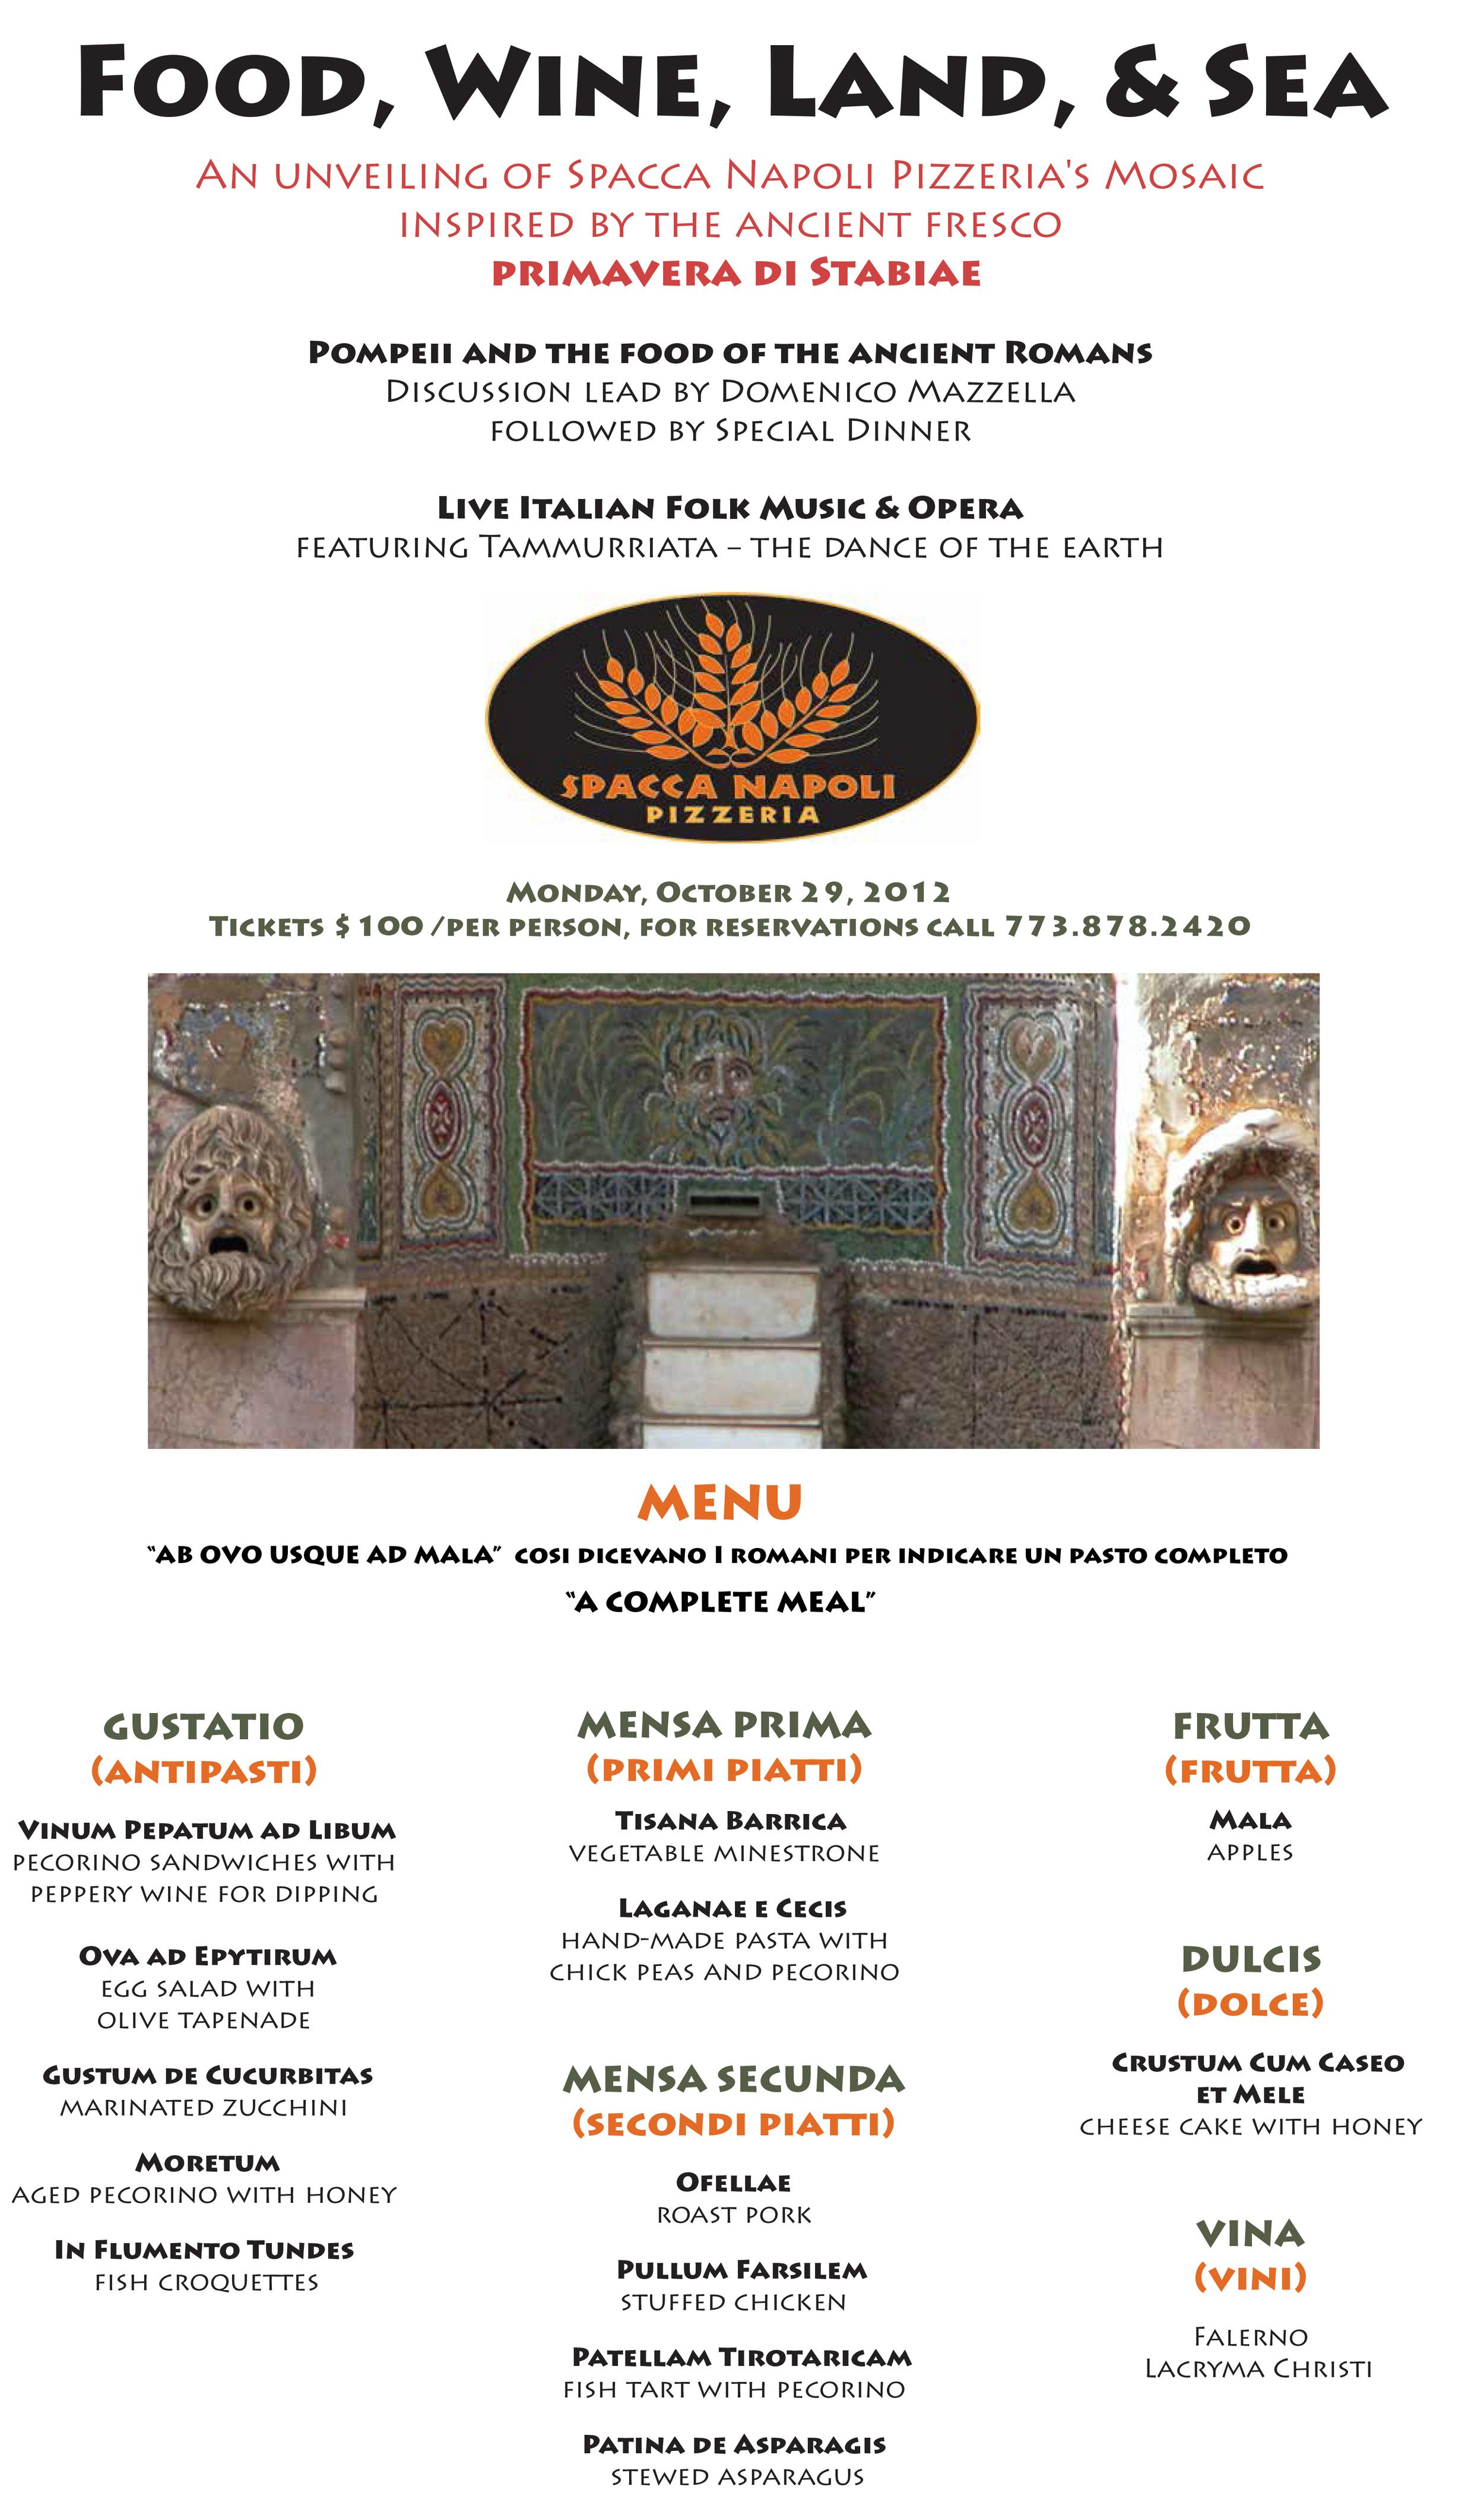 spacca-pompeii-poster-v8.jpg